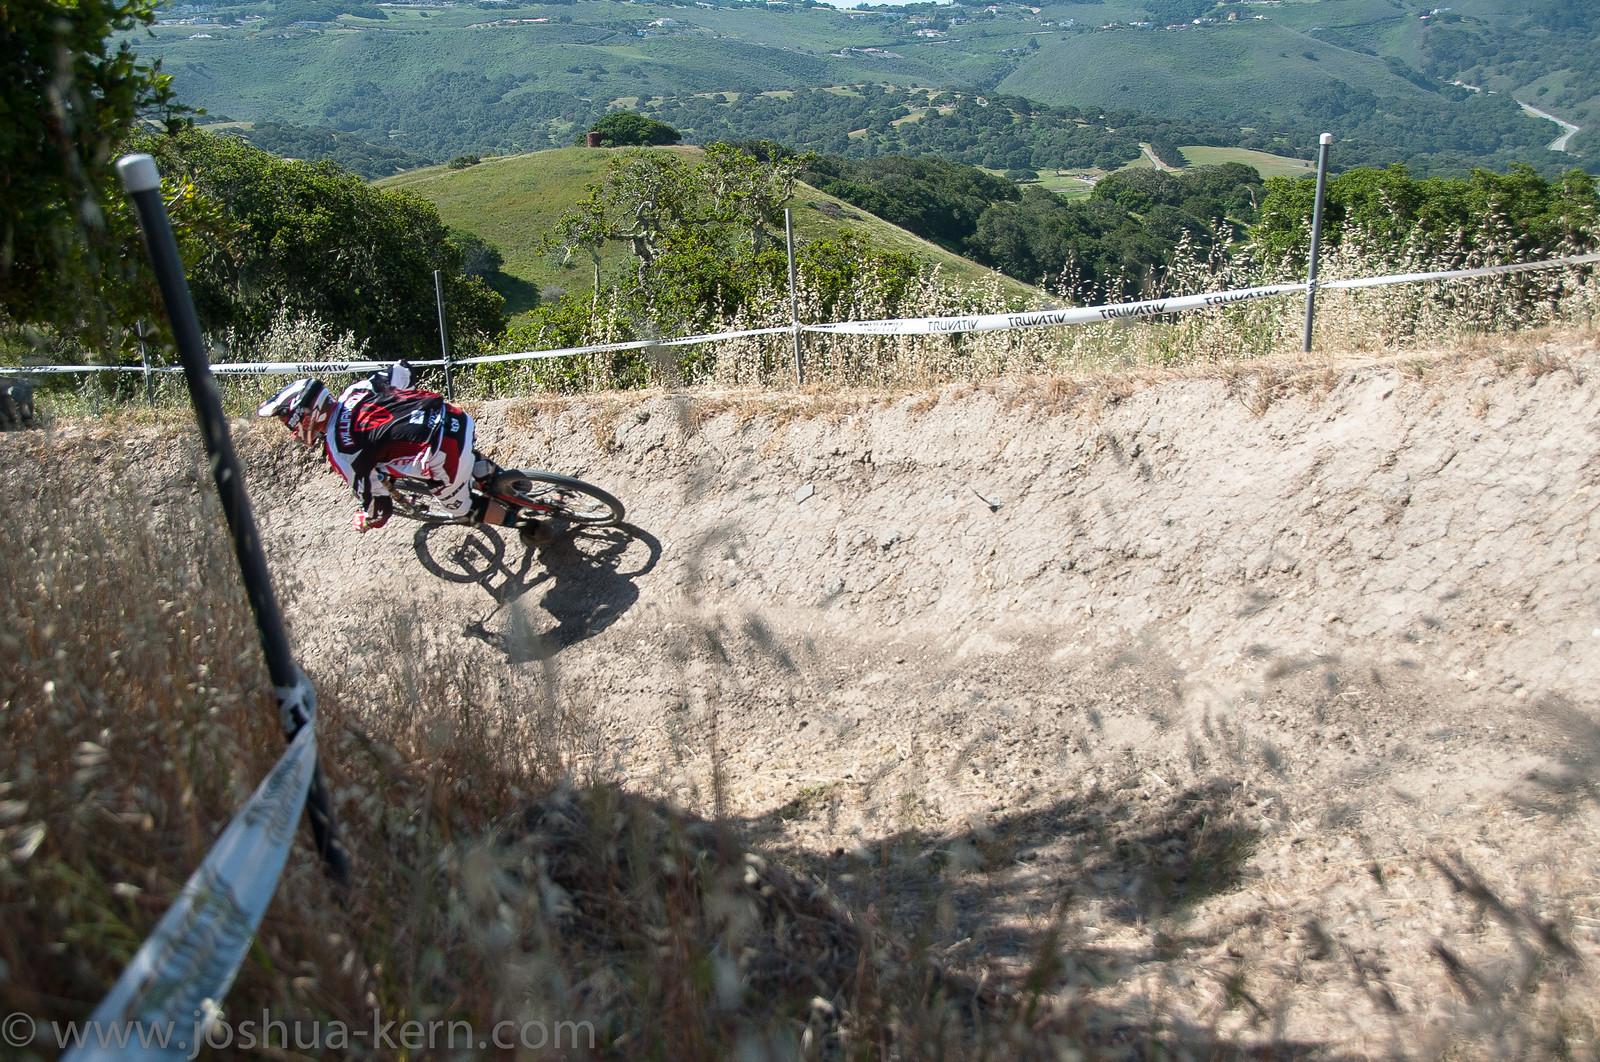 4-19-13DHPractice (32 of 36) - jkern620 - Mountain Biking Pictures - Vital MTB